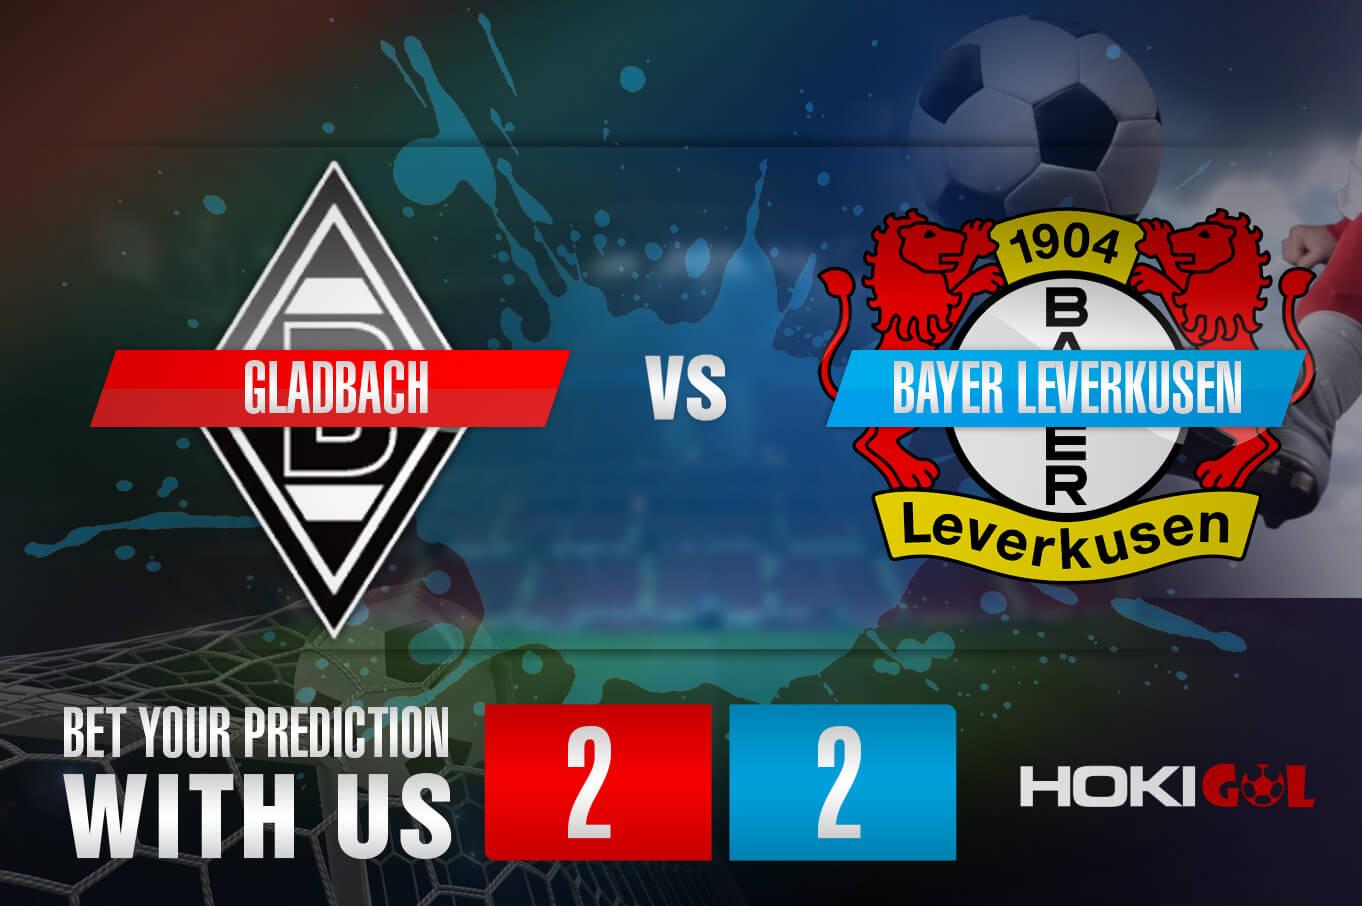 Prediksi Bola Gladbach Vs Bayer Leverkusen 6 Maret 2021